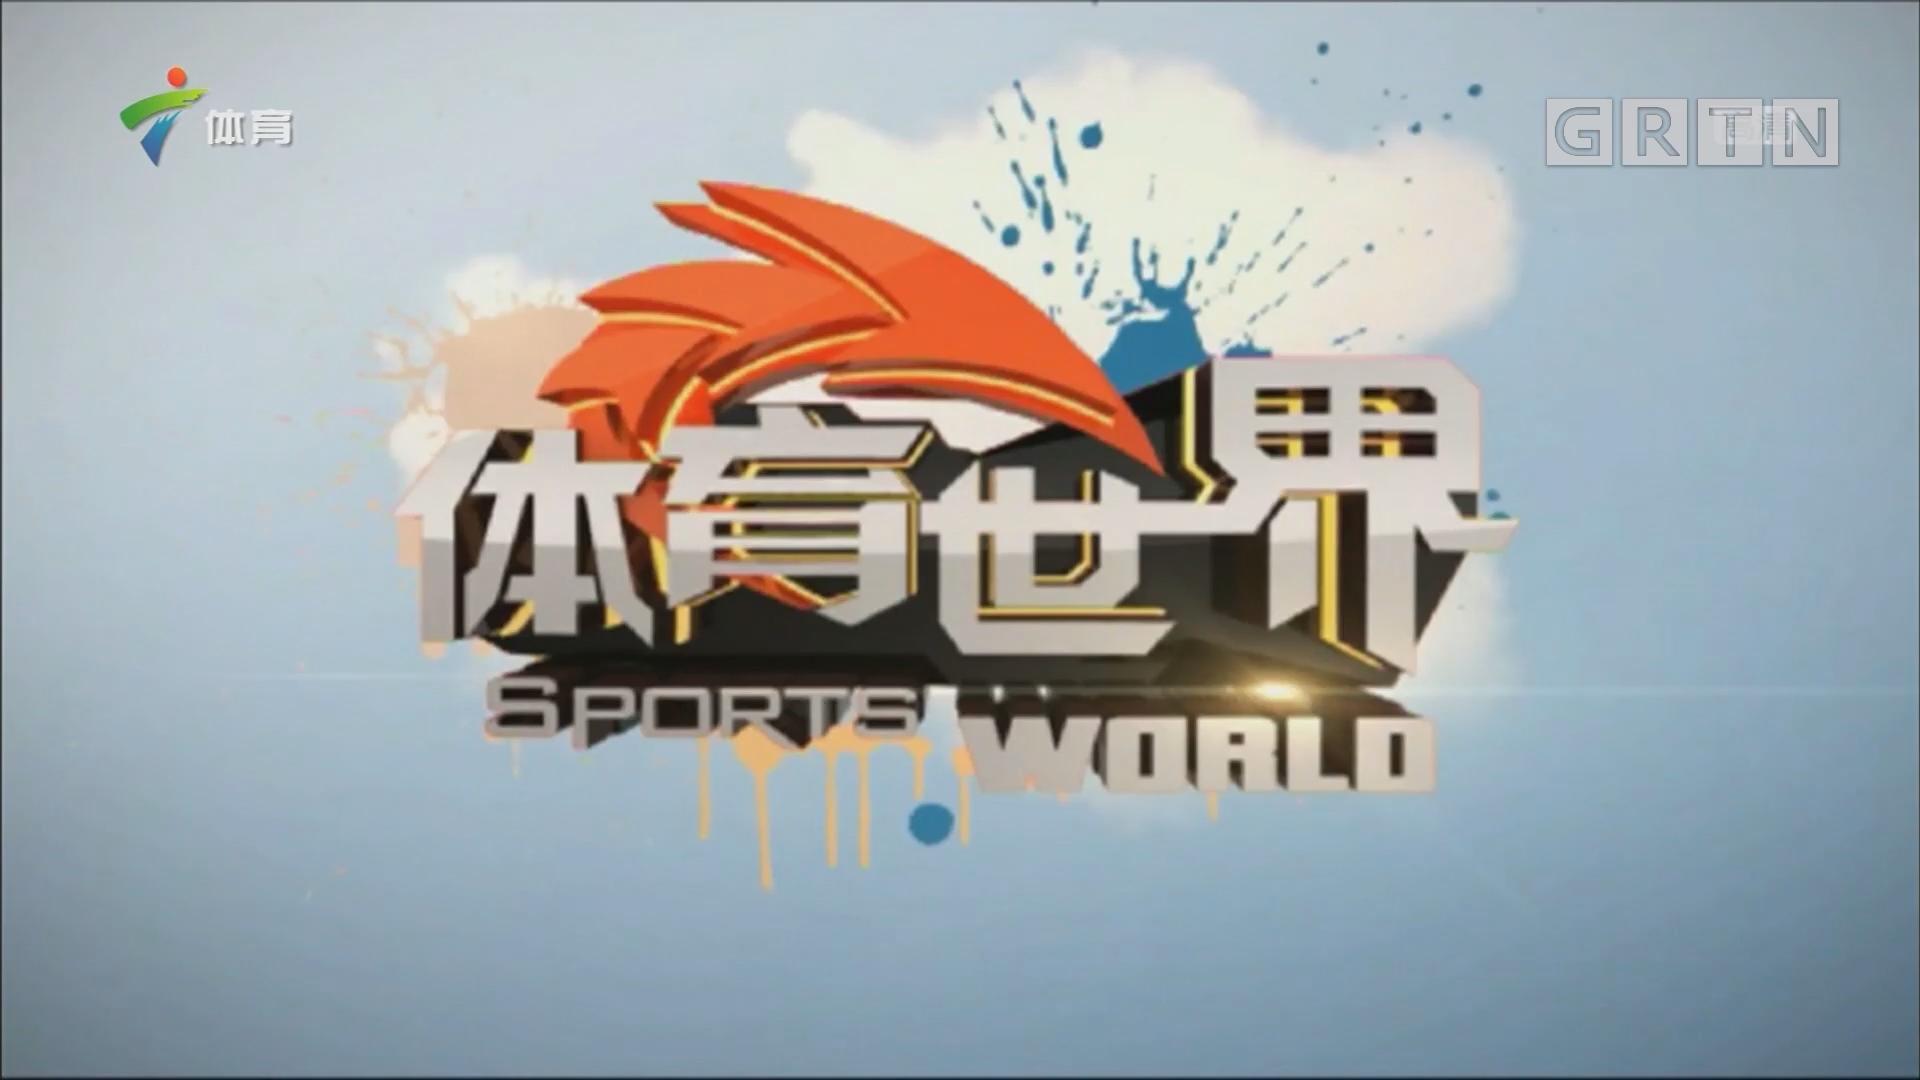 [HD][2017-10-19]体育世界:英雄联盟全球总决赛八强战今天打响